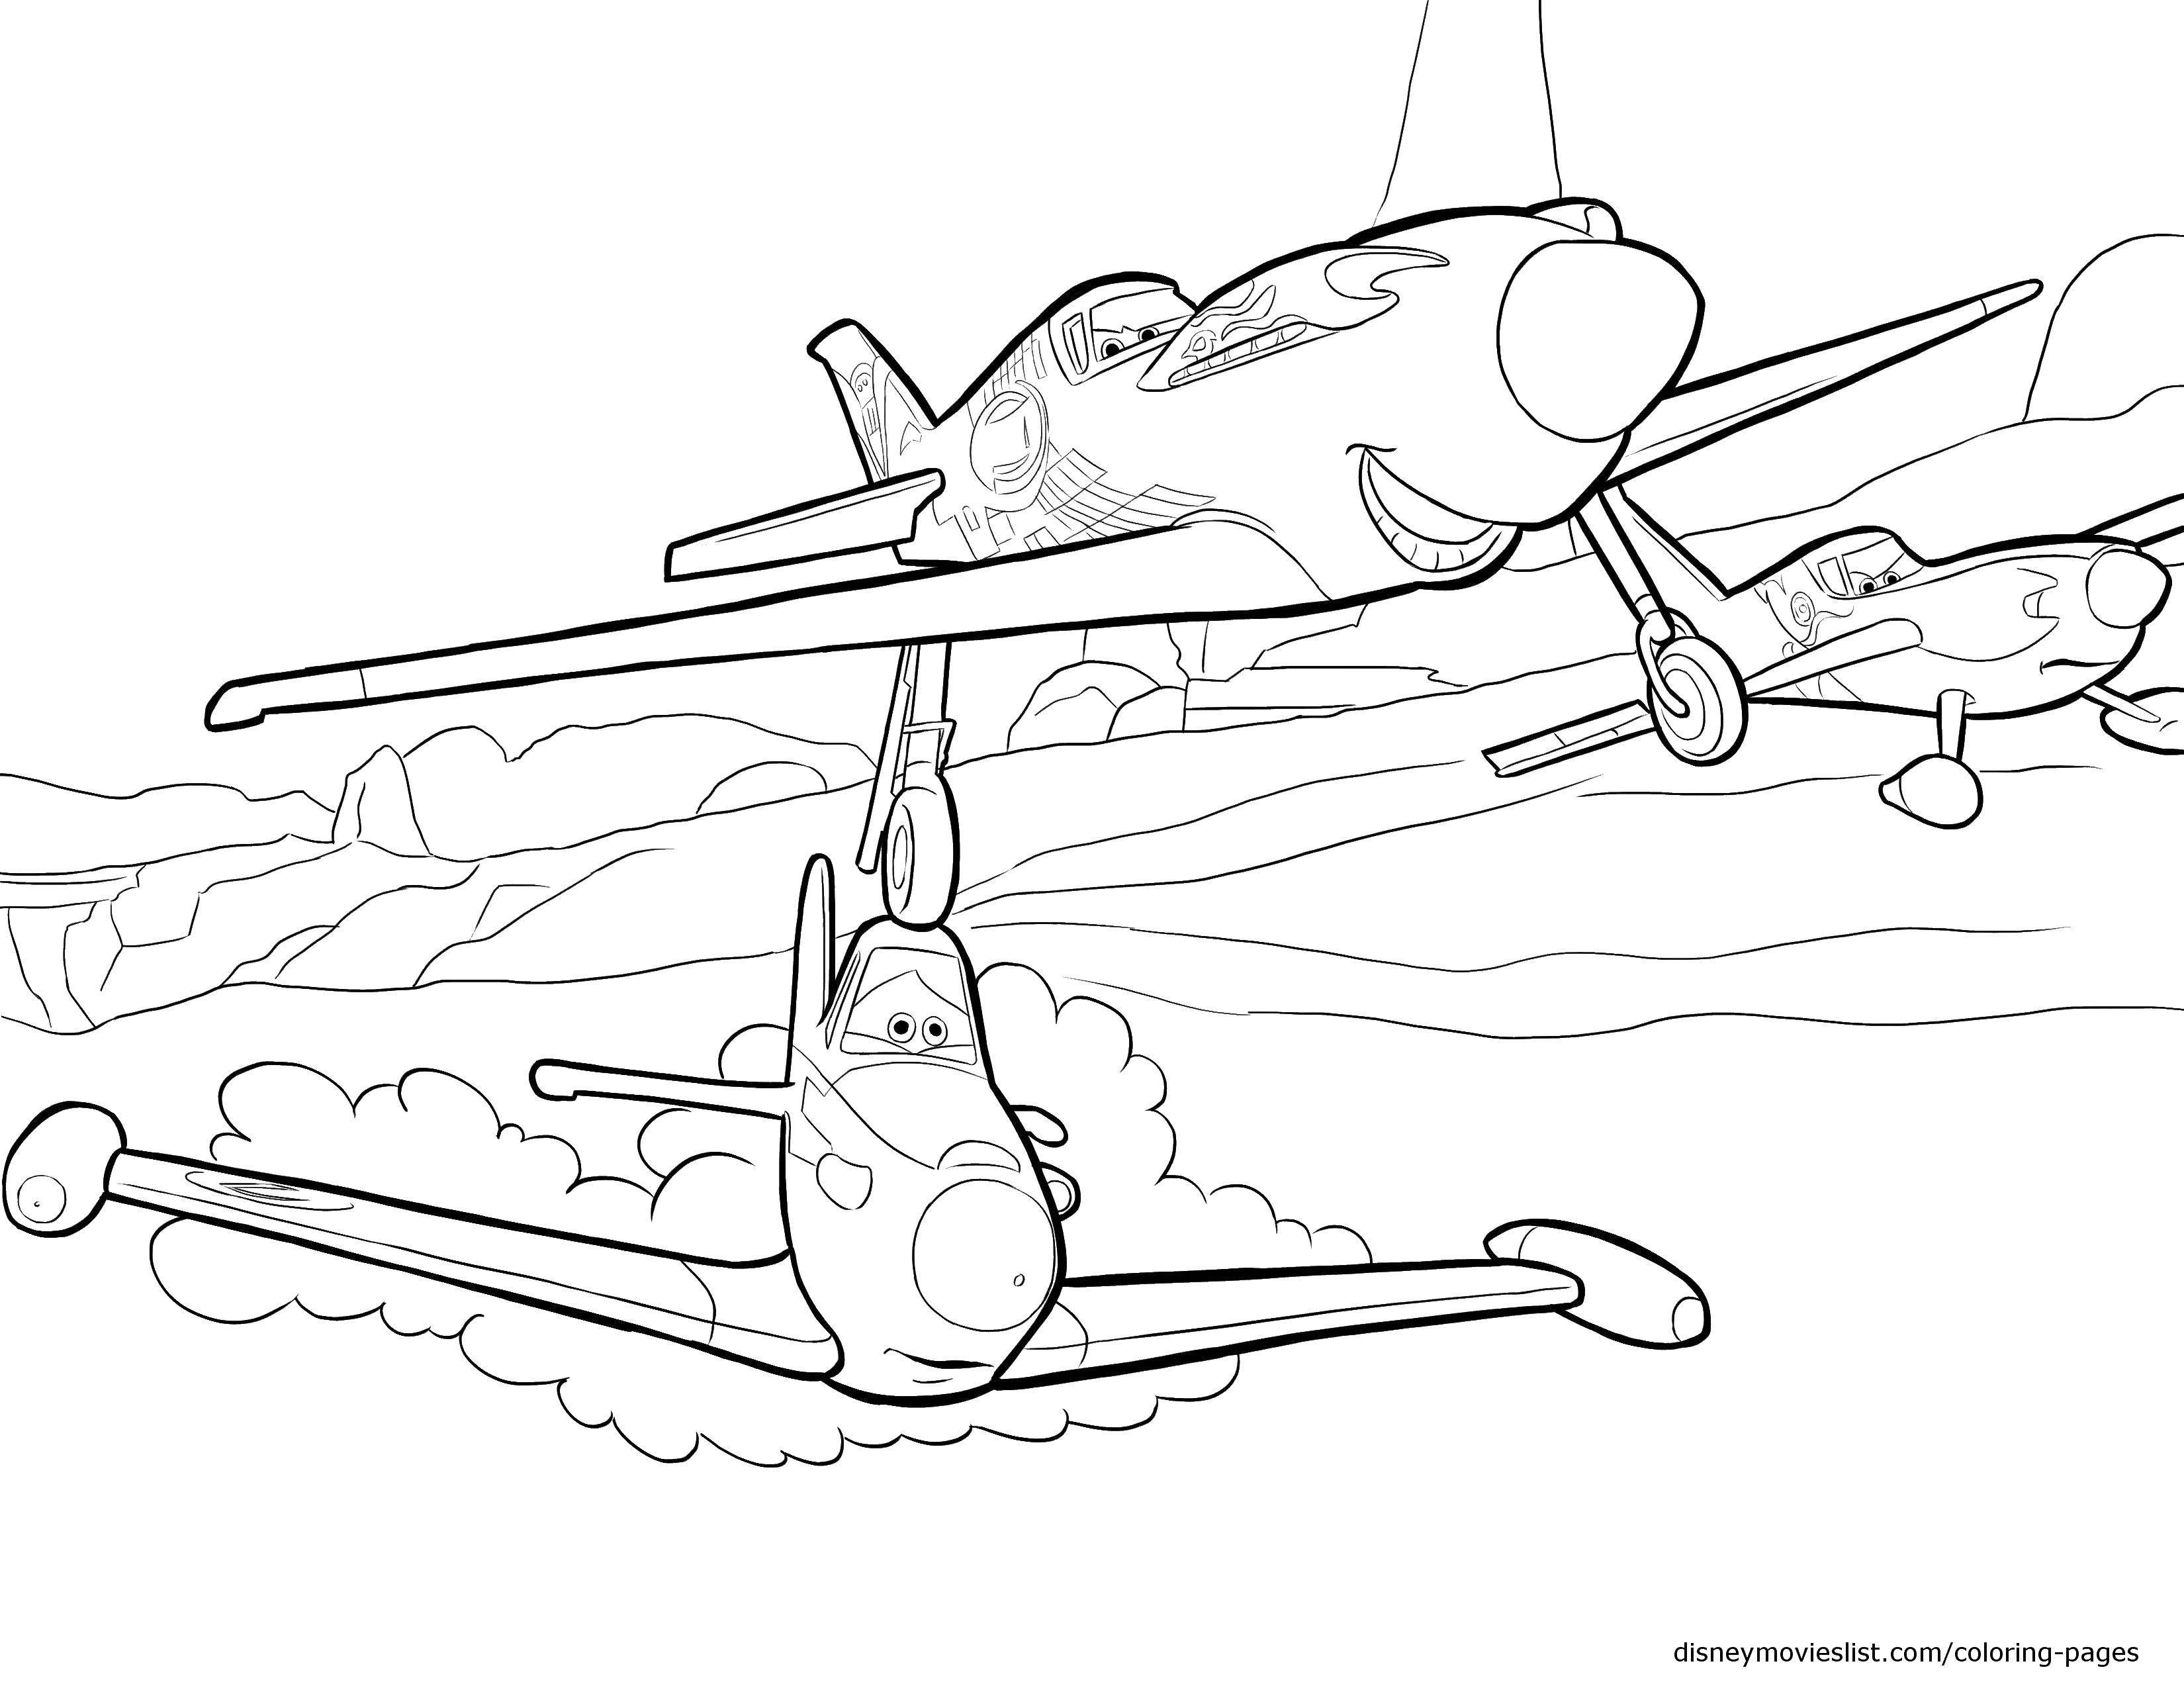 Название: Раскраска Три самолета с лицом. Категория: Самолеты. Теги: самолет, облака, глаза.